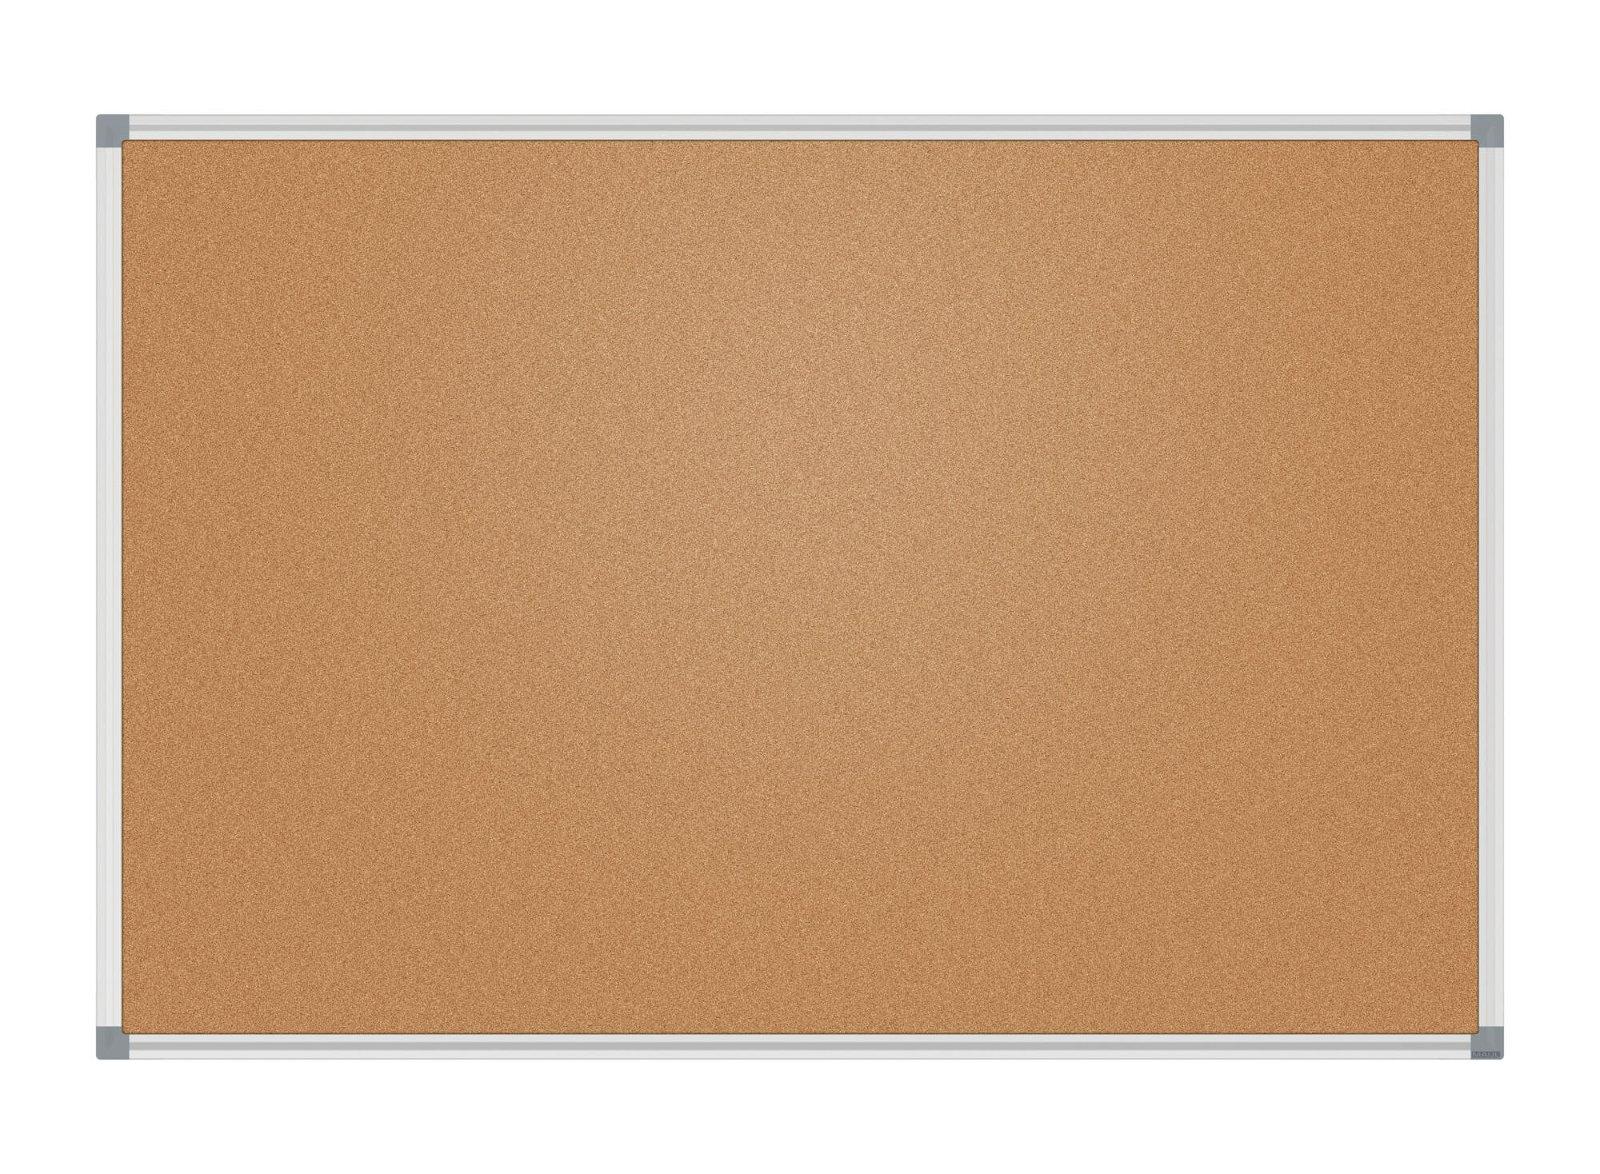 Pinnboard MAULstandard, 90x120 cm, Kork, SB-Verpackung, grau